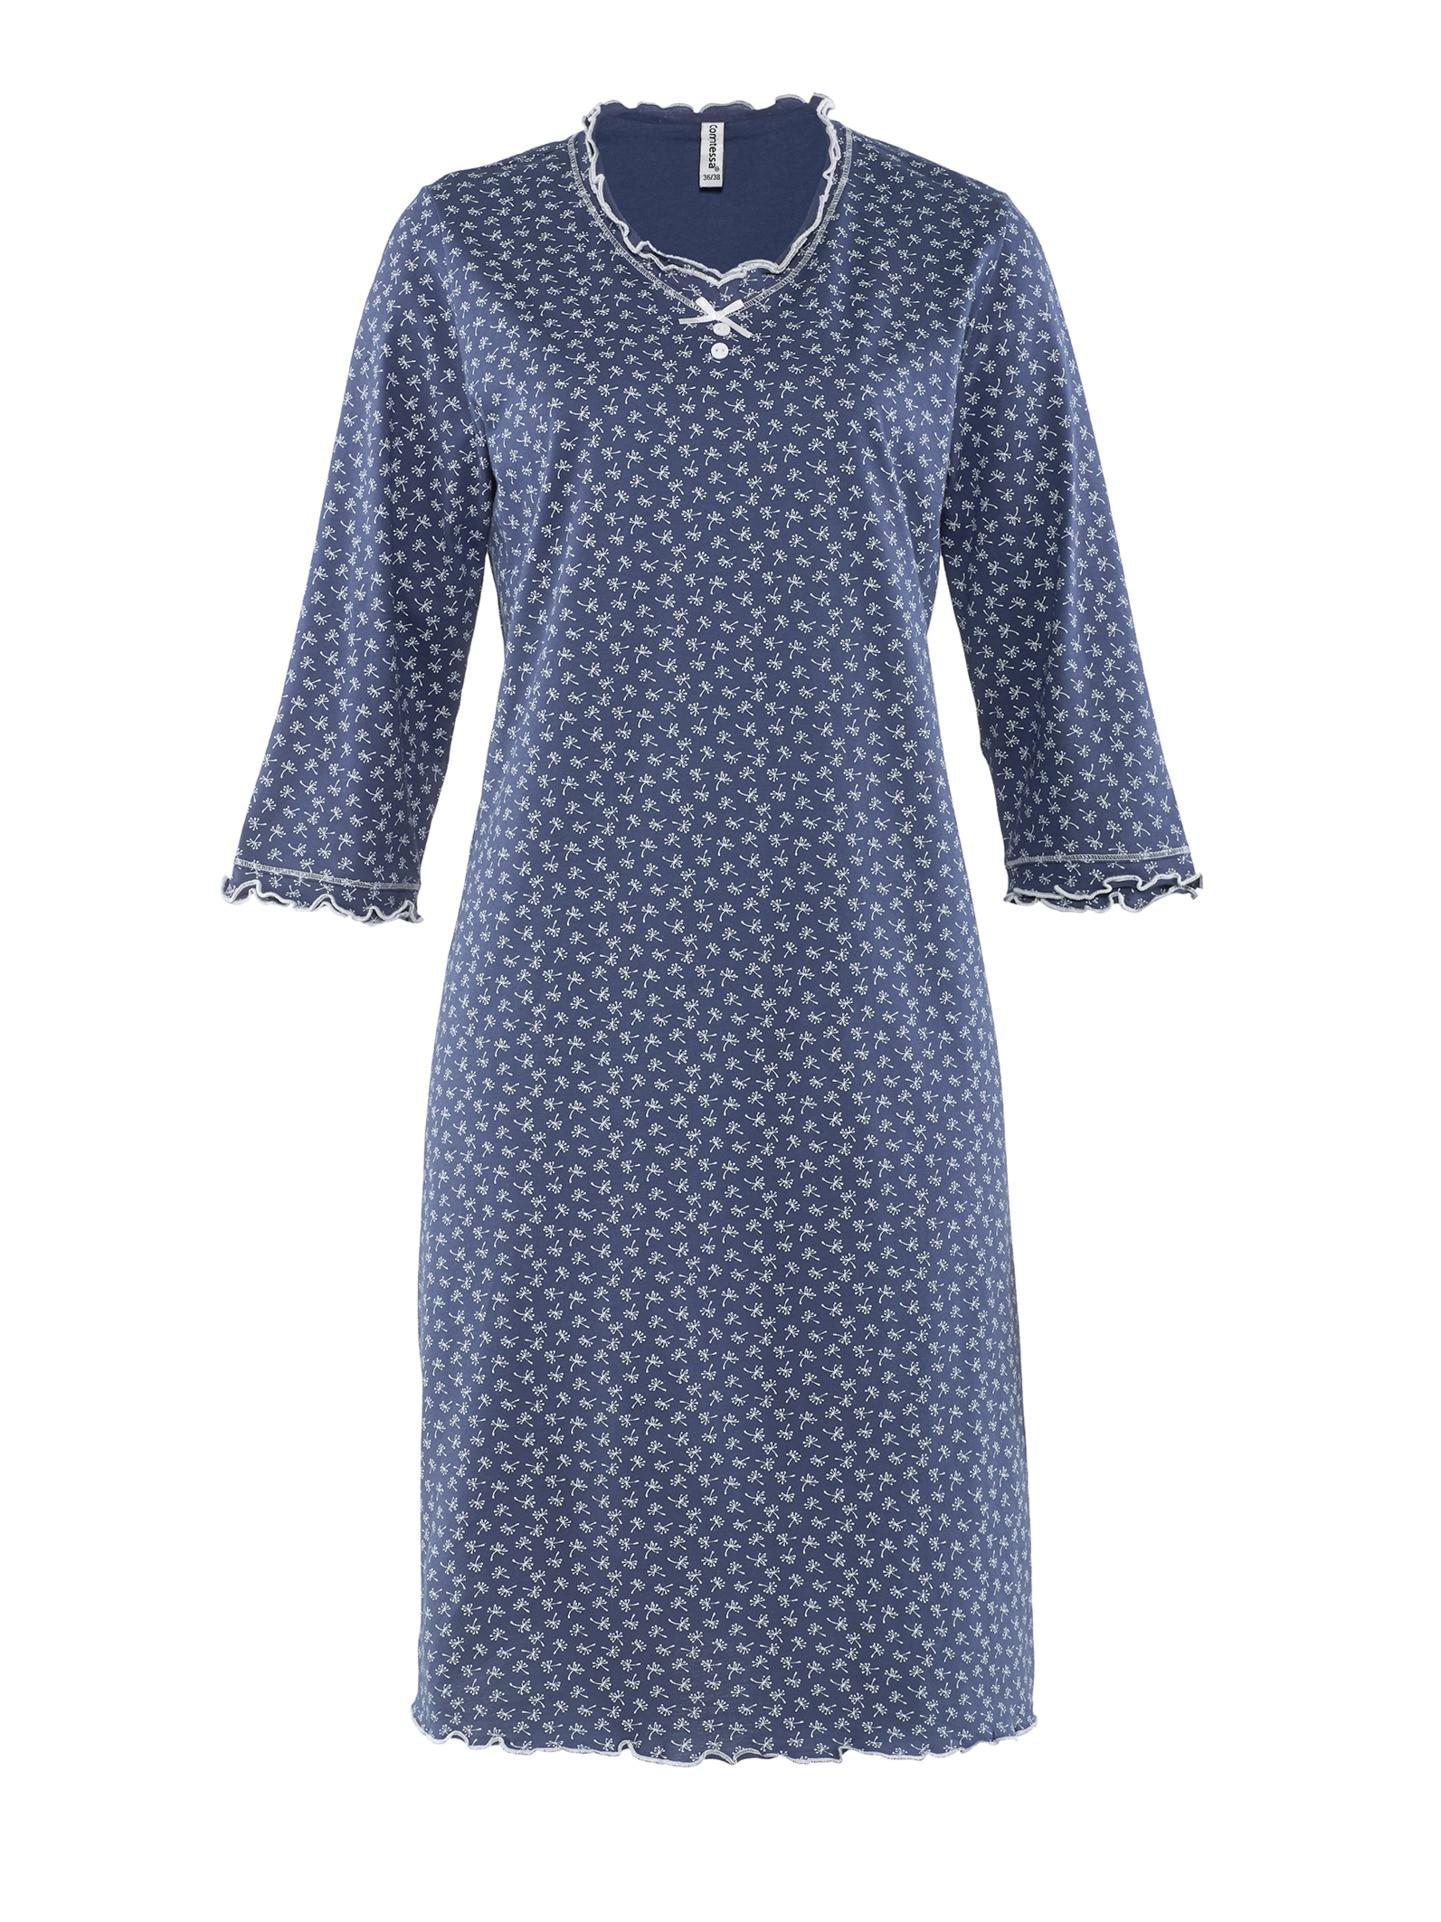 Avena Damen Soft-Nachthemd Baumwolle Blau 42-6407-7